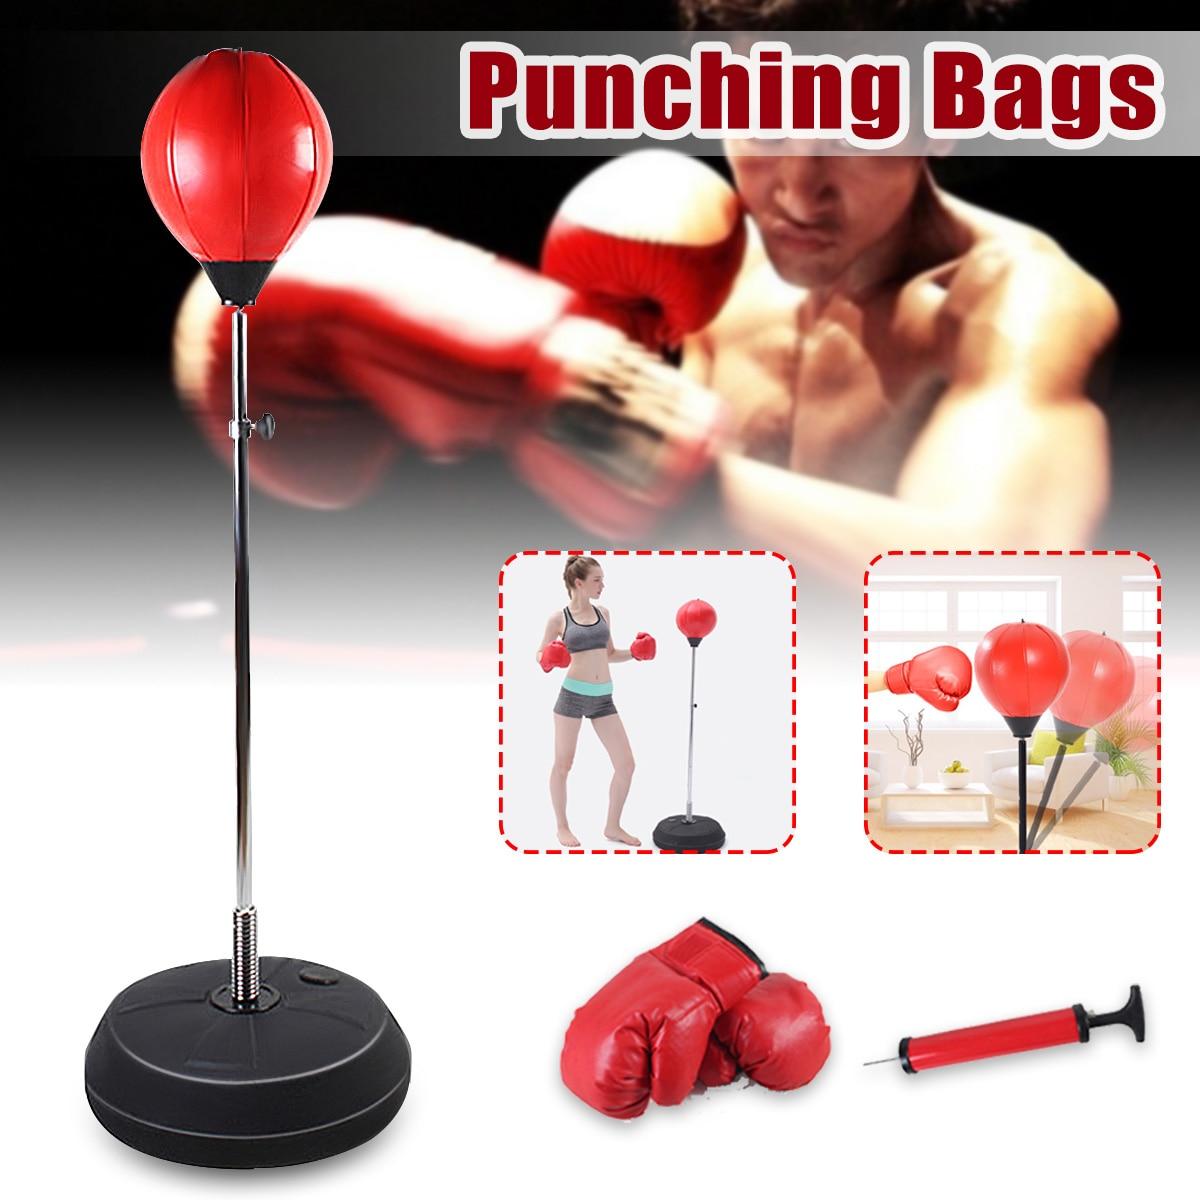 Bolas de velocidad de pera de boxeo de Fitness ajustable, bolsa para boxeo relajada, bolsa para boxeo a prueba de golpes, bolsa de velocidad para guante de adulto + bomba + pelota